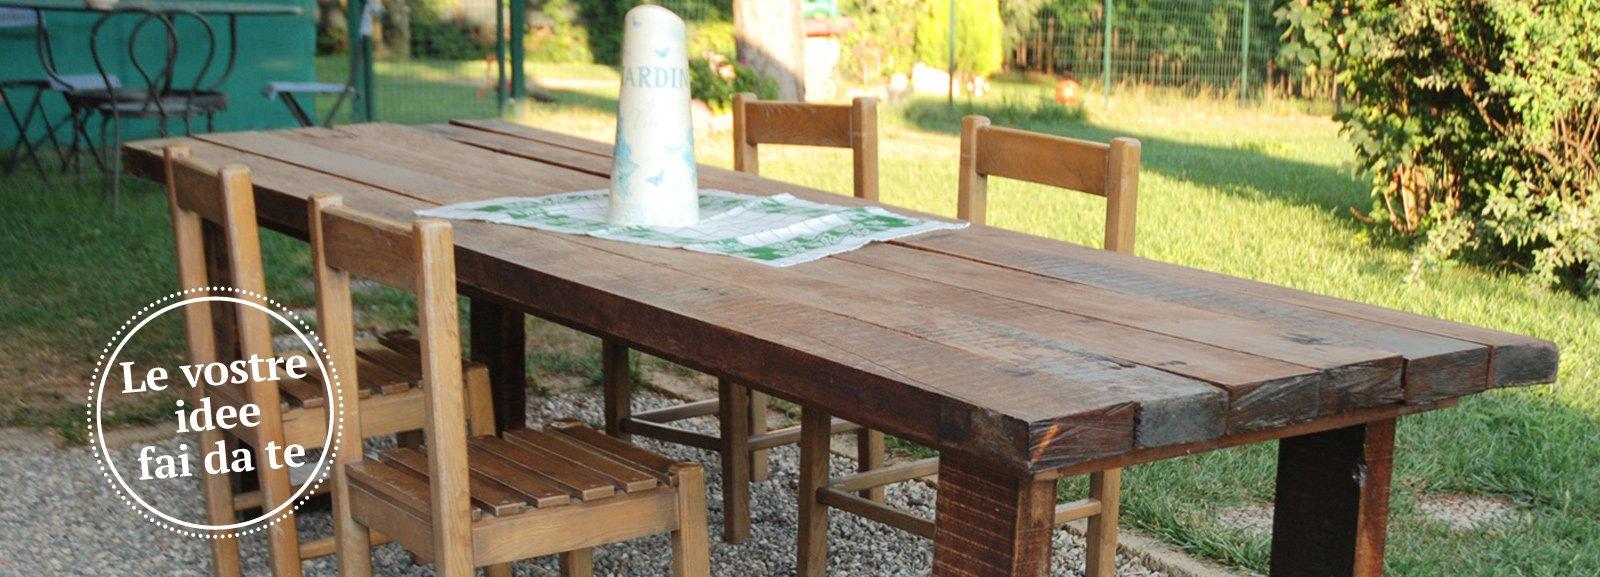 Cucine per case in legno ~ avienix.com for .